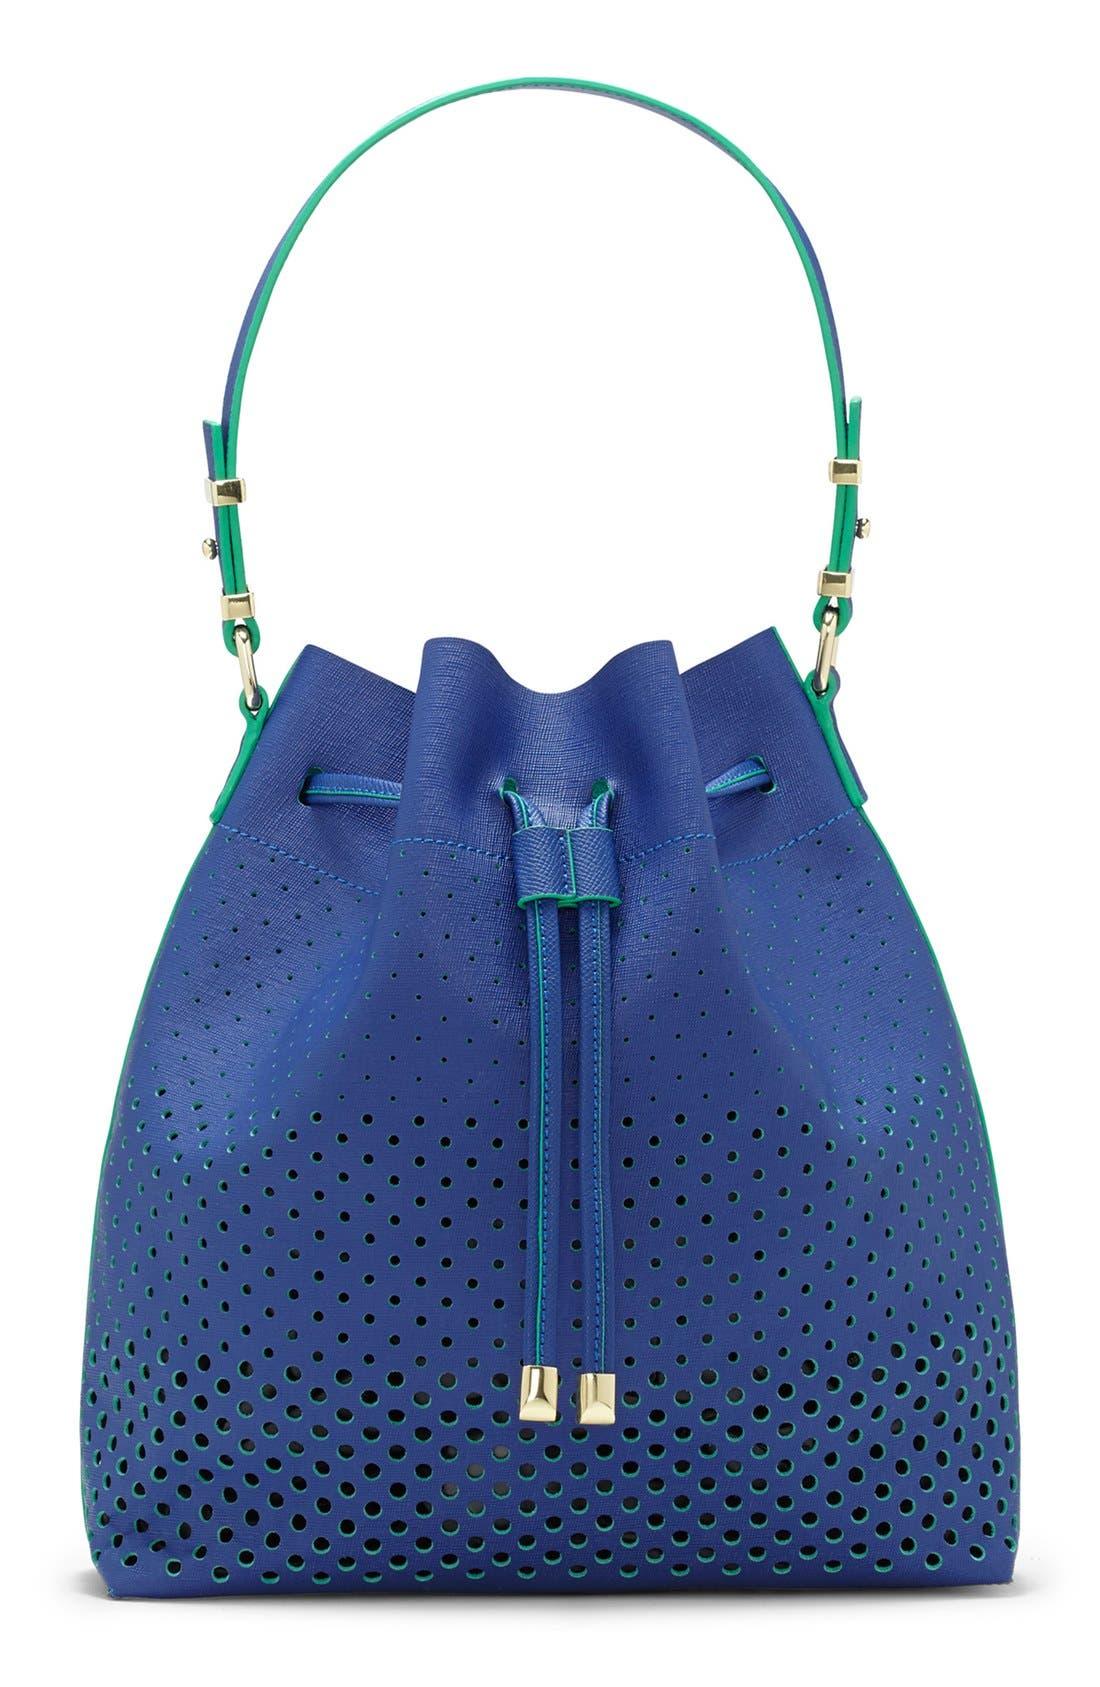 Alternate Image 1 Selected - Vince Camuto 'Leila' Drawstring Bucket Bag